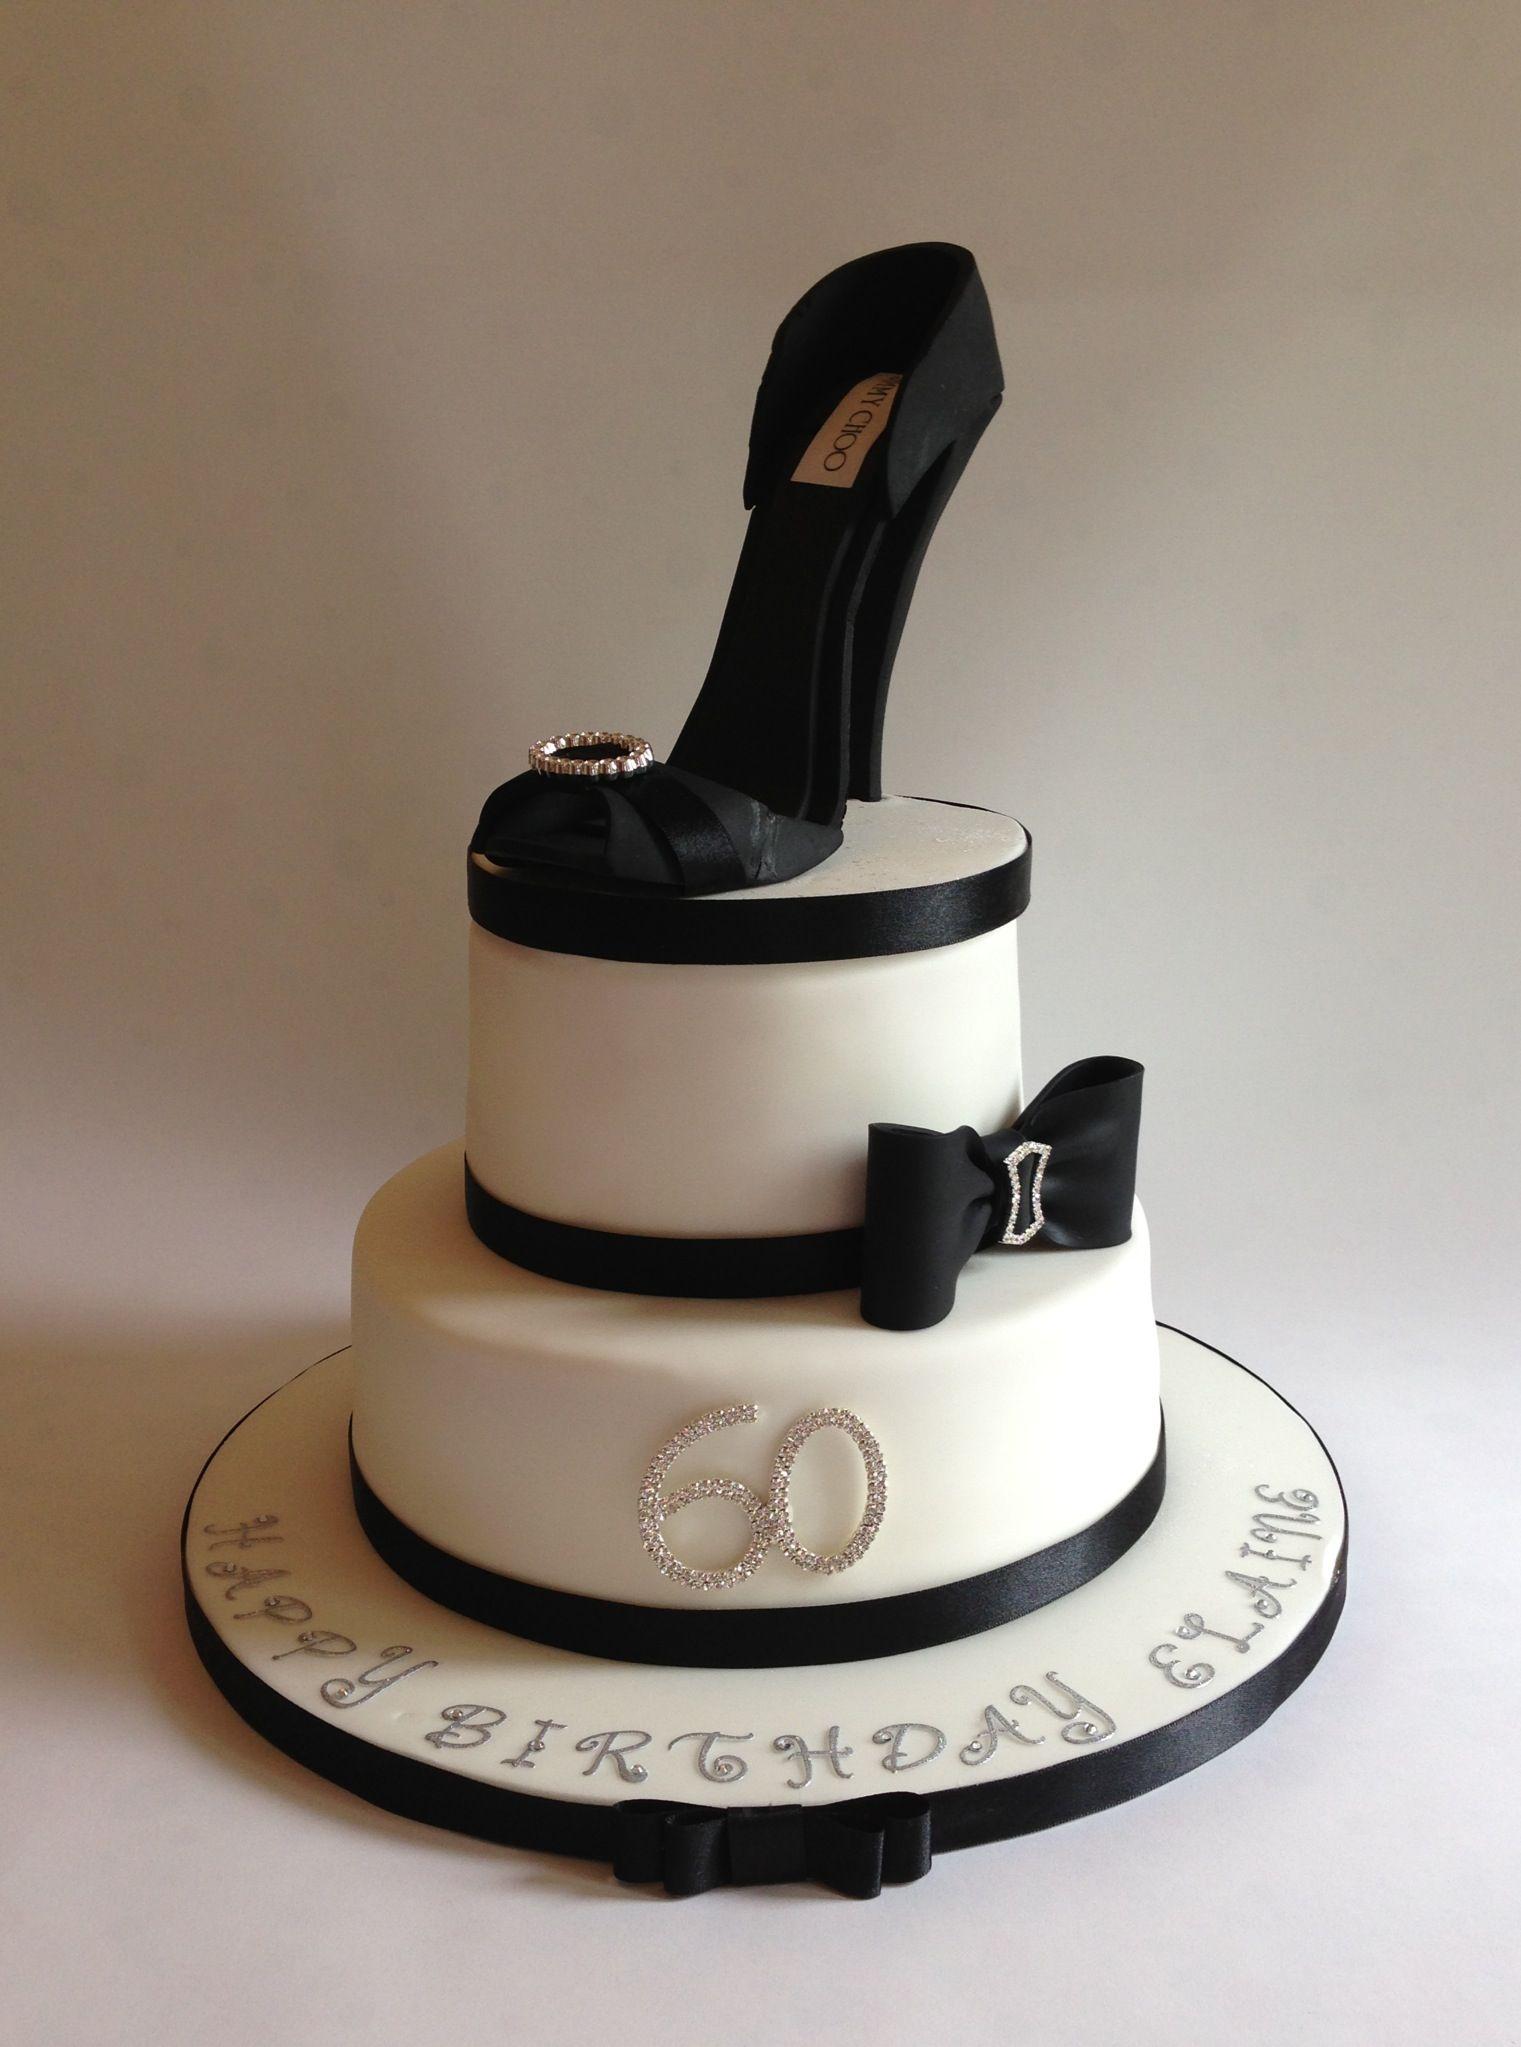 Jimmy Choo inspired birthday cake for Elaine's 60th ...